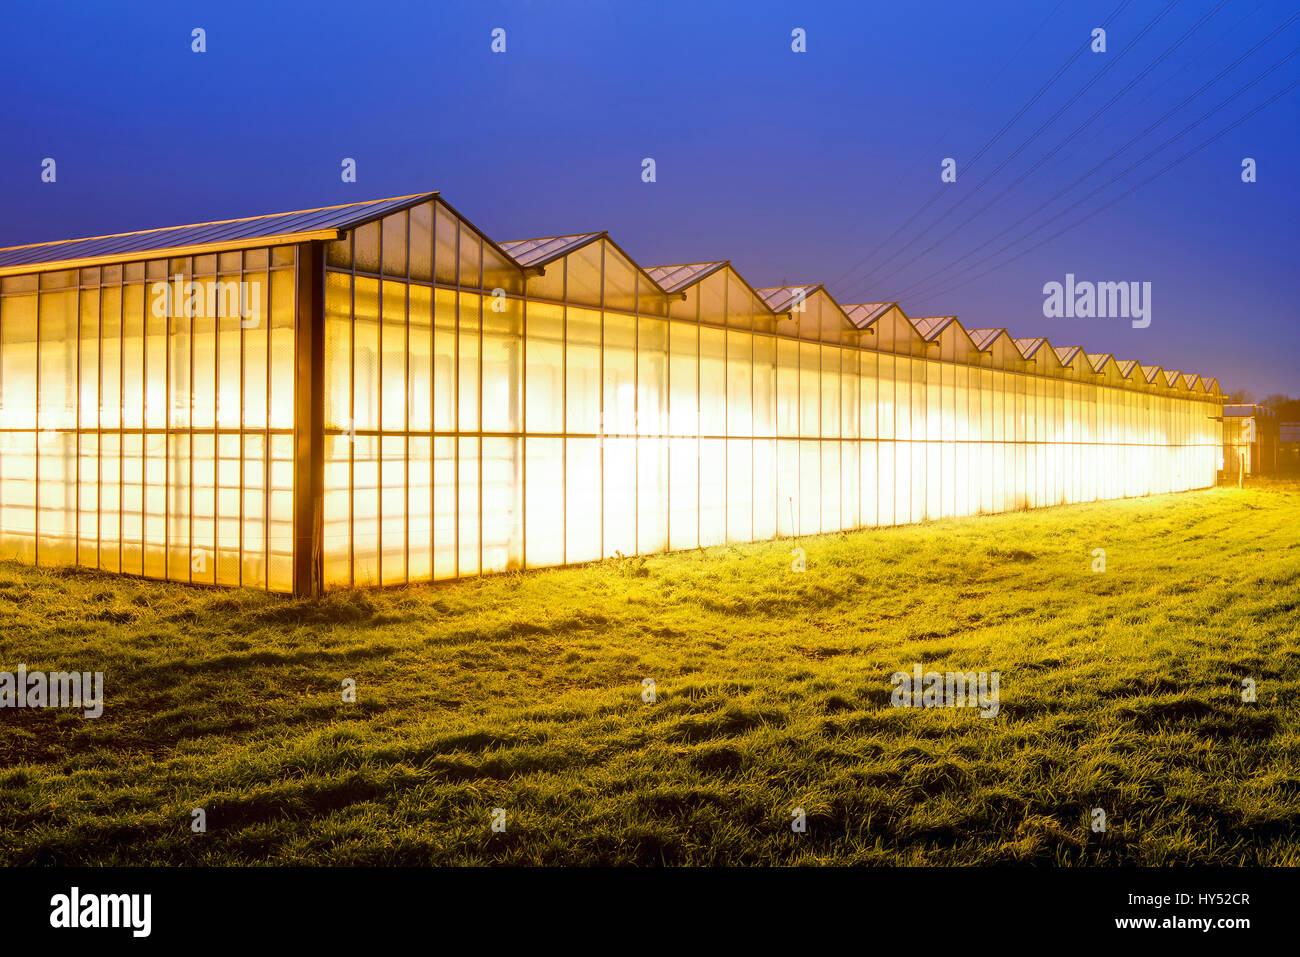 Illuminated greenhouses in the 4 and march landing, Hamburg, Germany, Europe, Beleuchtete Gewaechshaeuser in den - Stock Image